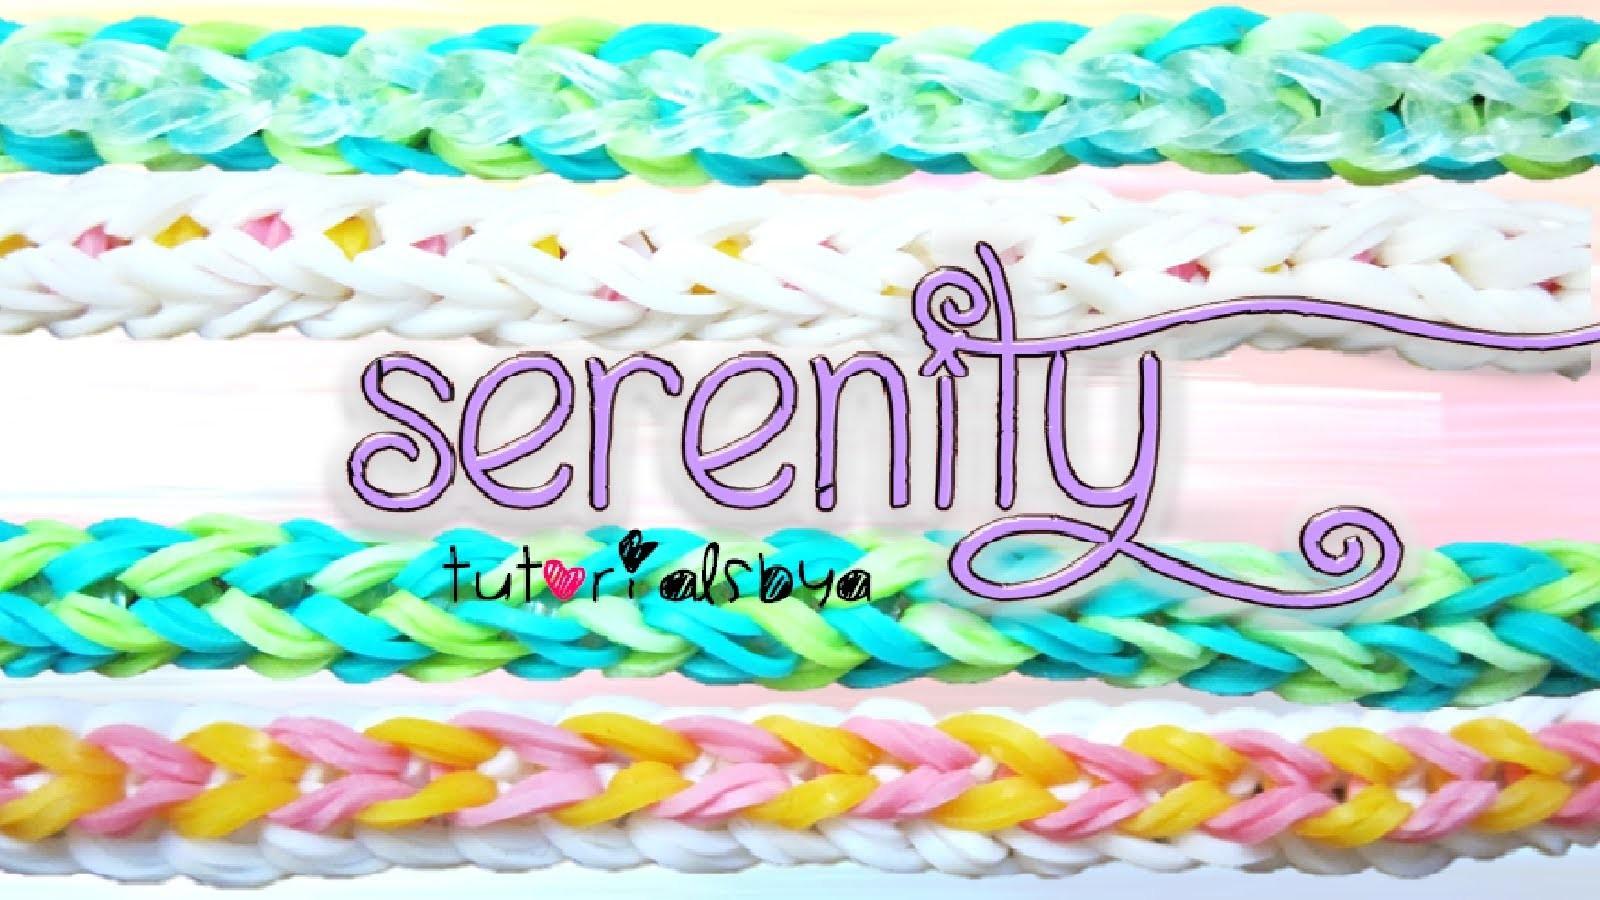 NEW REVERSIBLE Serenity Rainbow Loom Bracelet Tutorial | How To